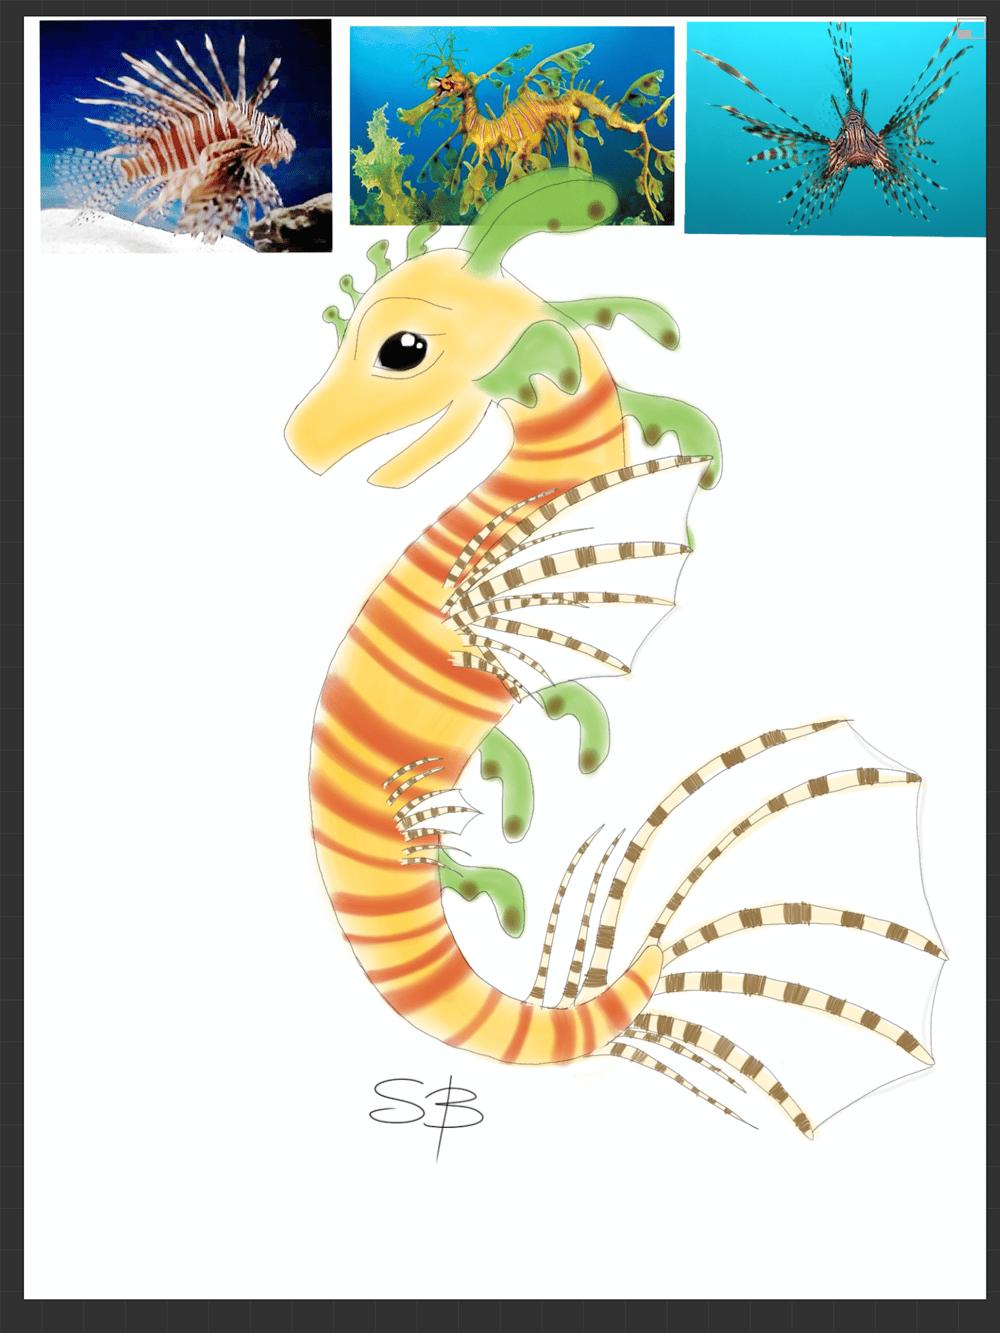 Lion Fish/Leafy Sea Dragon - image 3 - student project